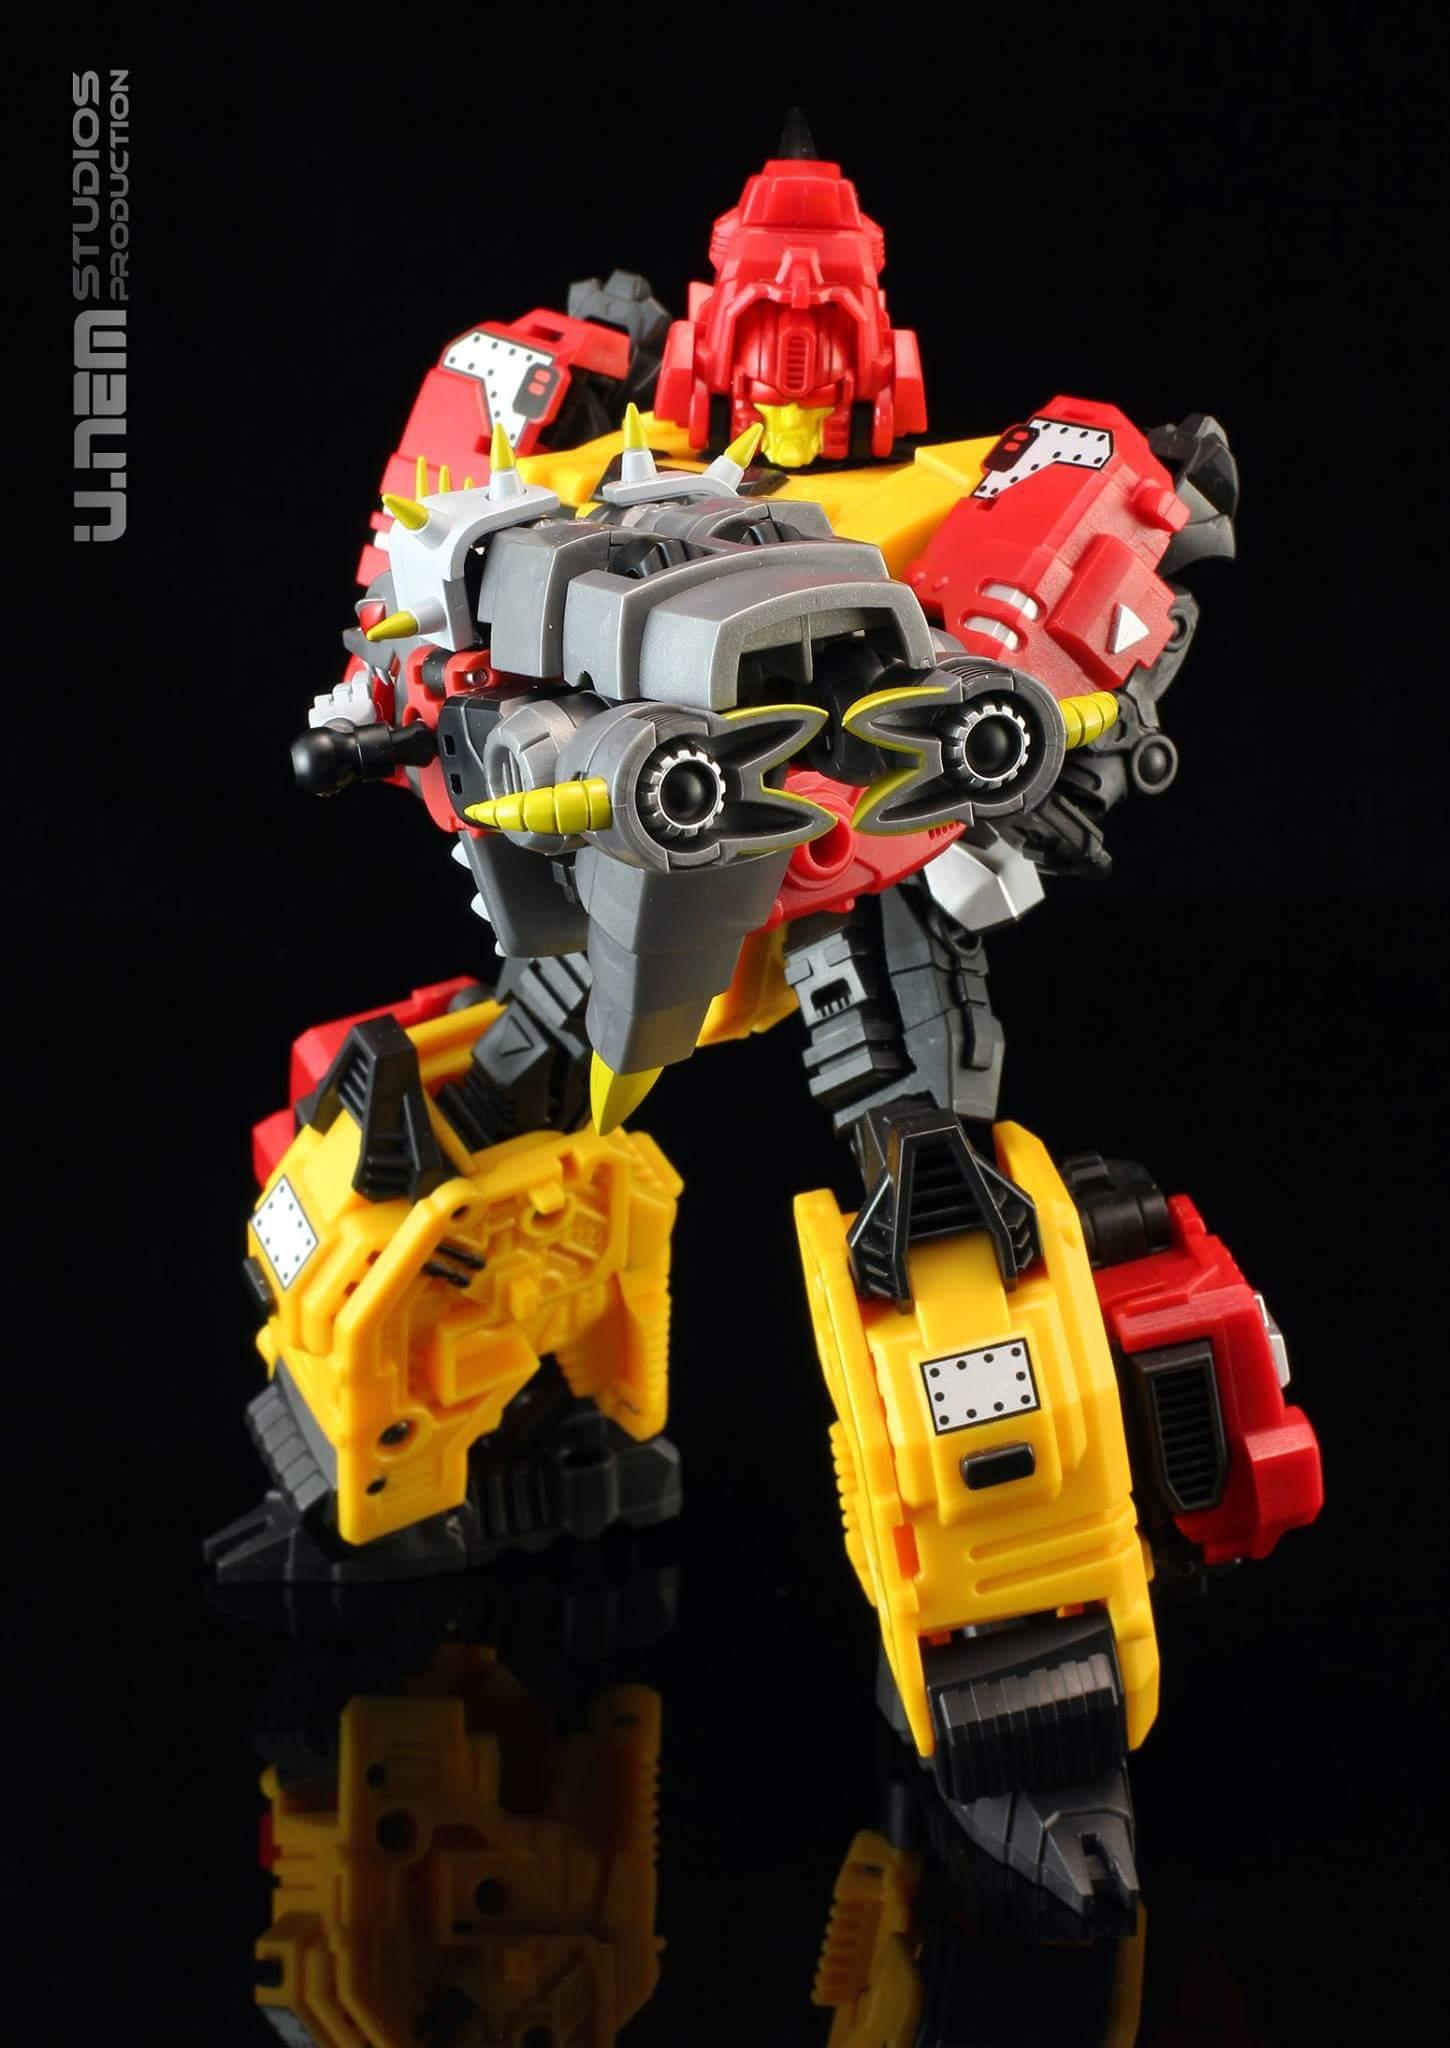 Produit Tiers: [Corbot V] CV-002 Mugger - aka Allicon   [Unique Toys] G-02 Sharky - aka Sharkticon/Requanicon FN8DnBSr